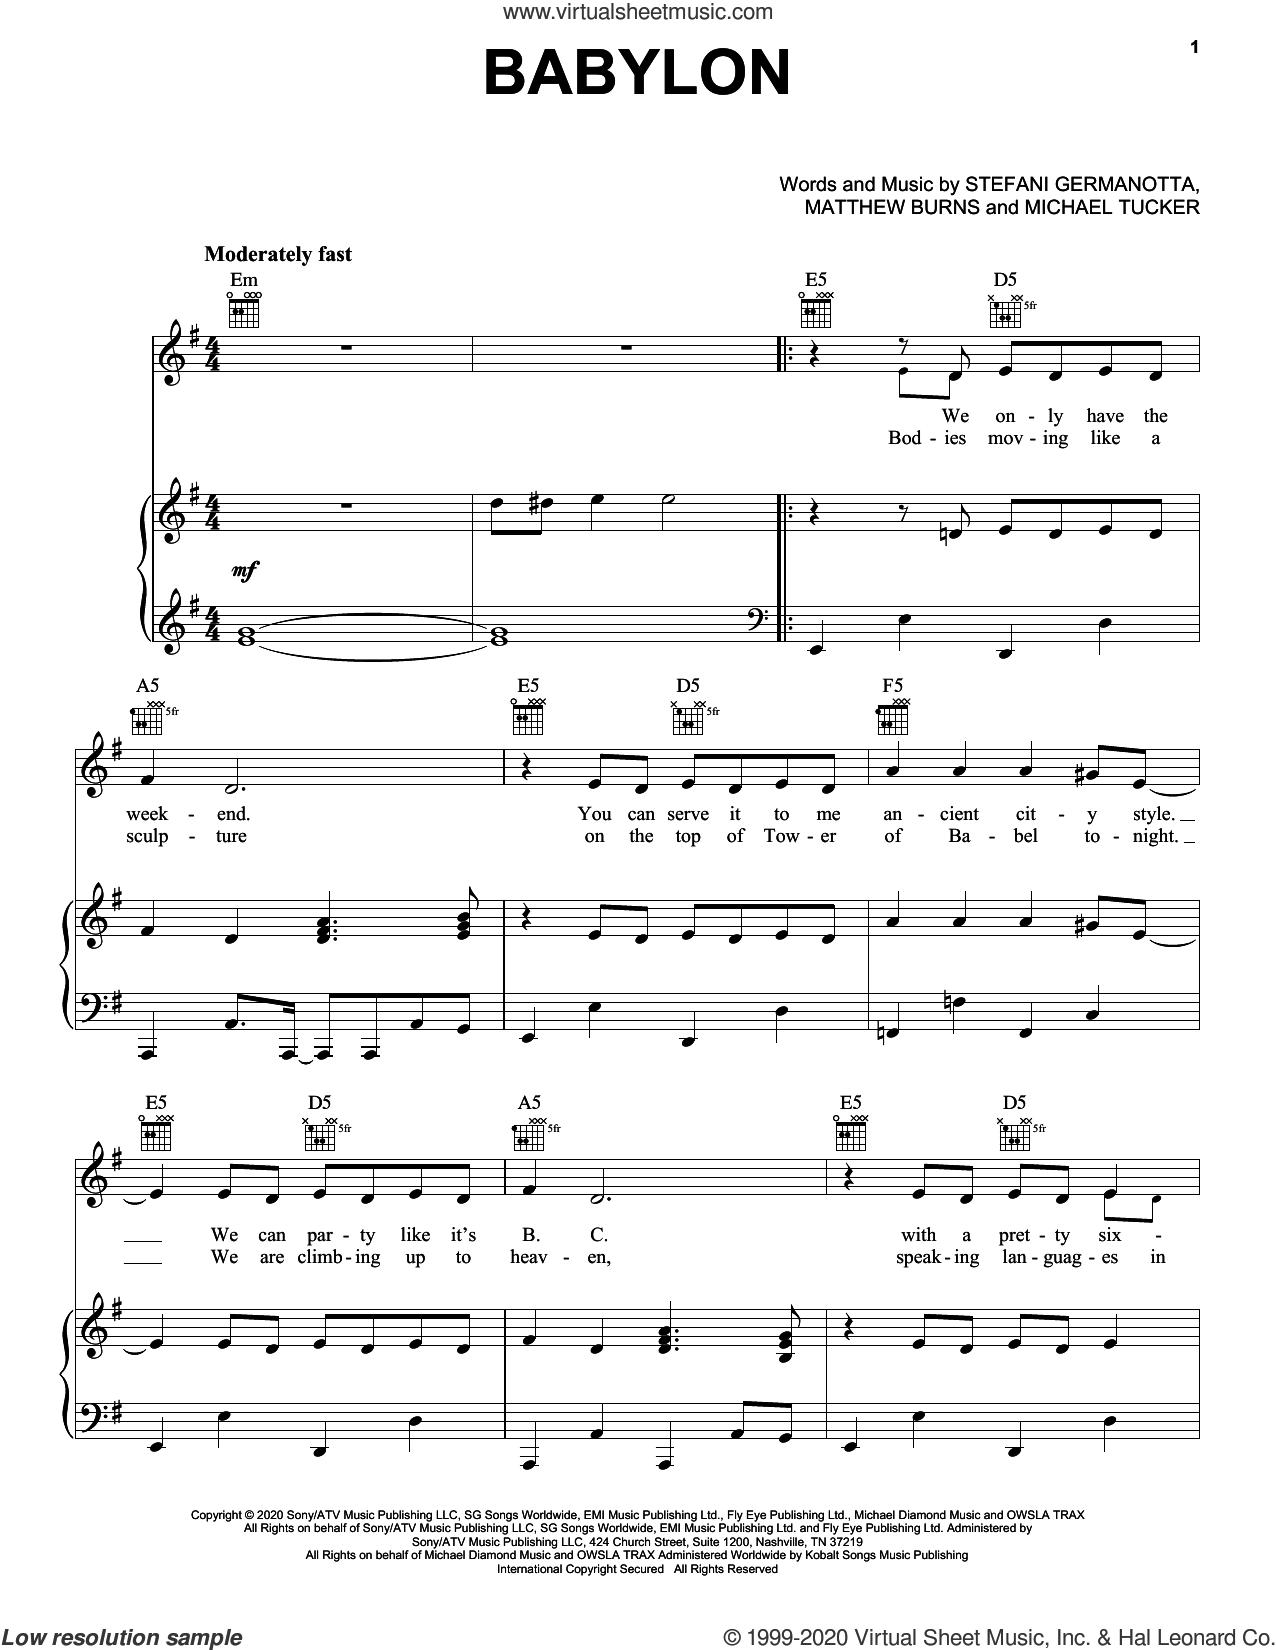 Babylon sheet music for voice, piano or guitar by Lady Gaga, Matthew Burns and Michael Tucker, intermediate skill level